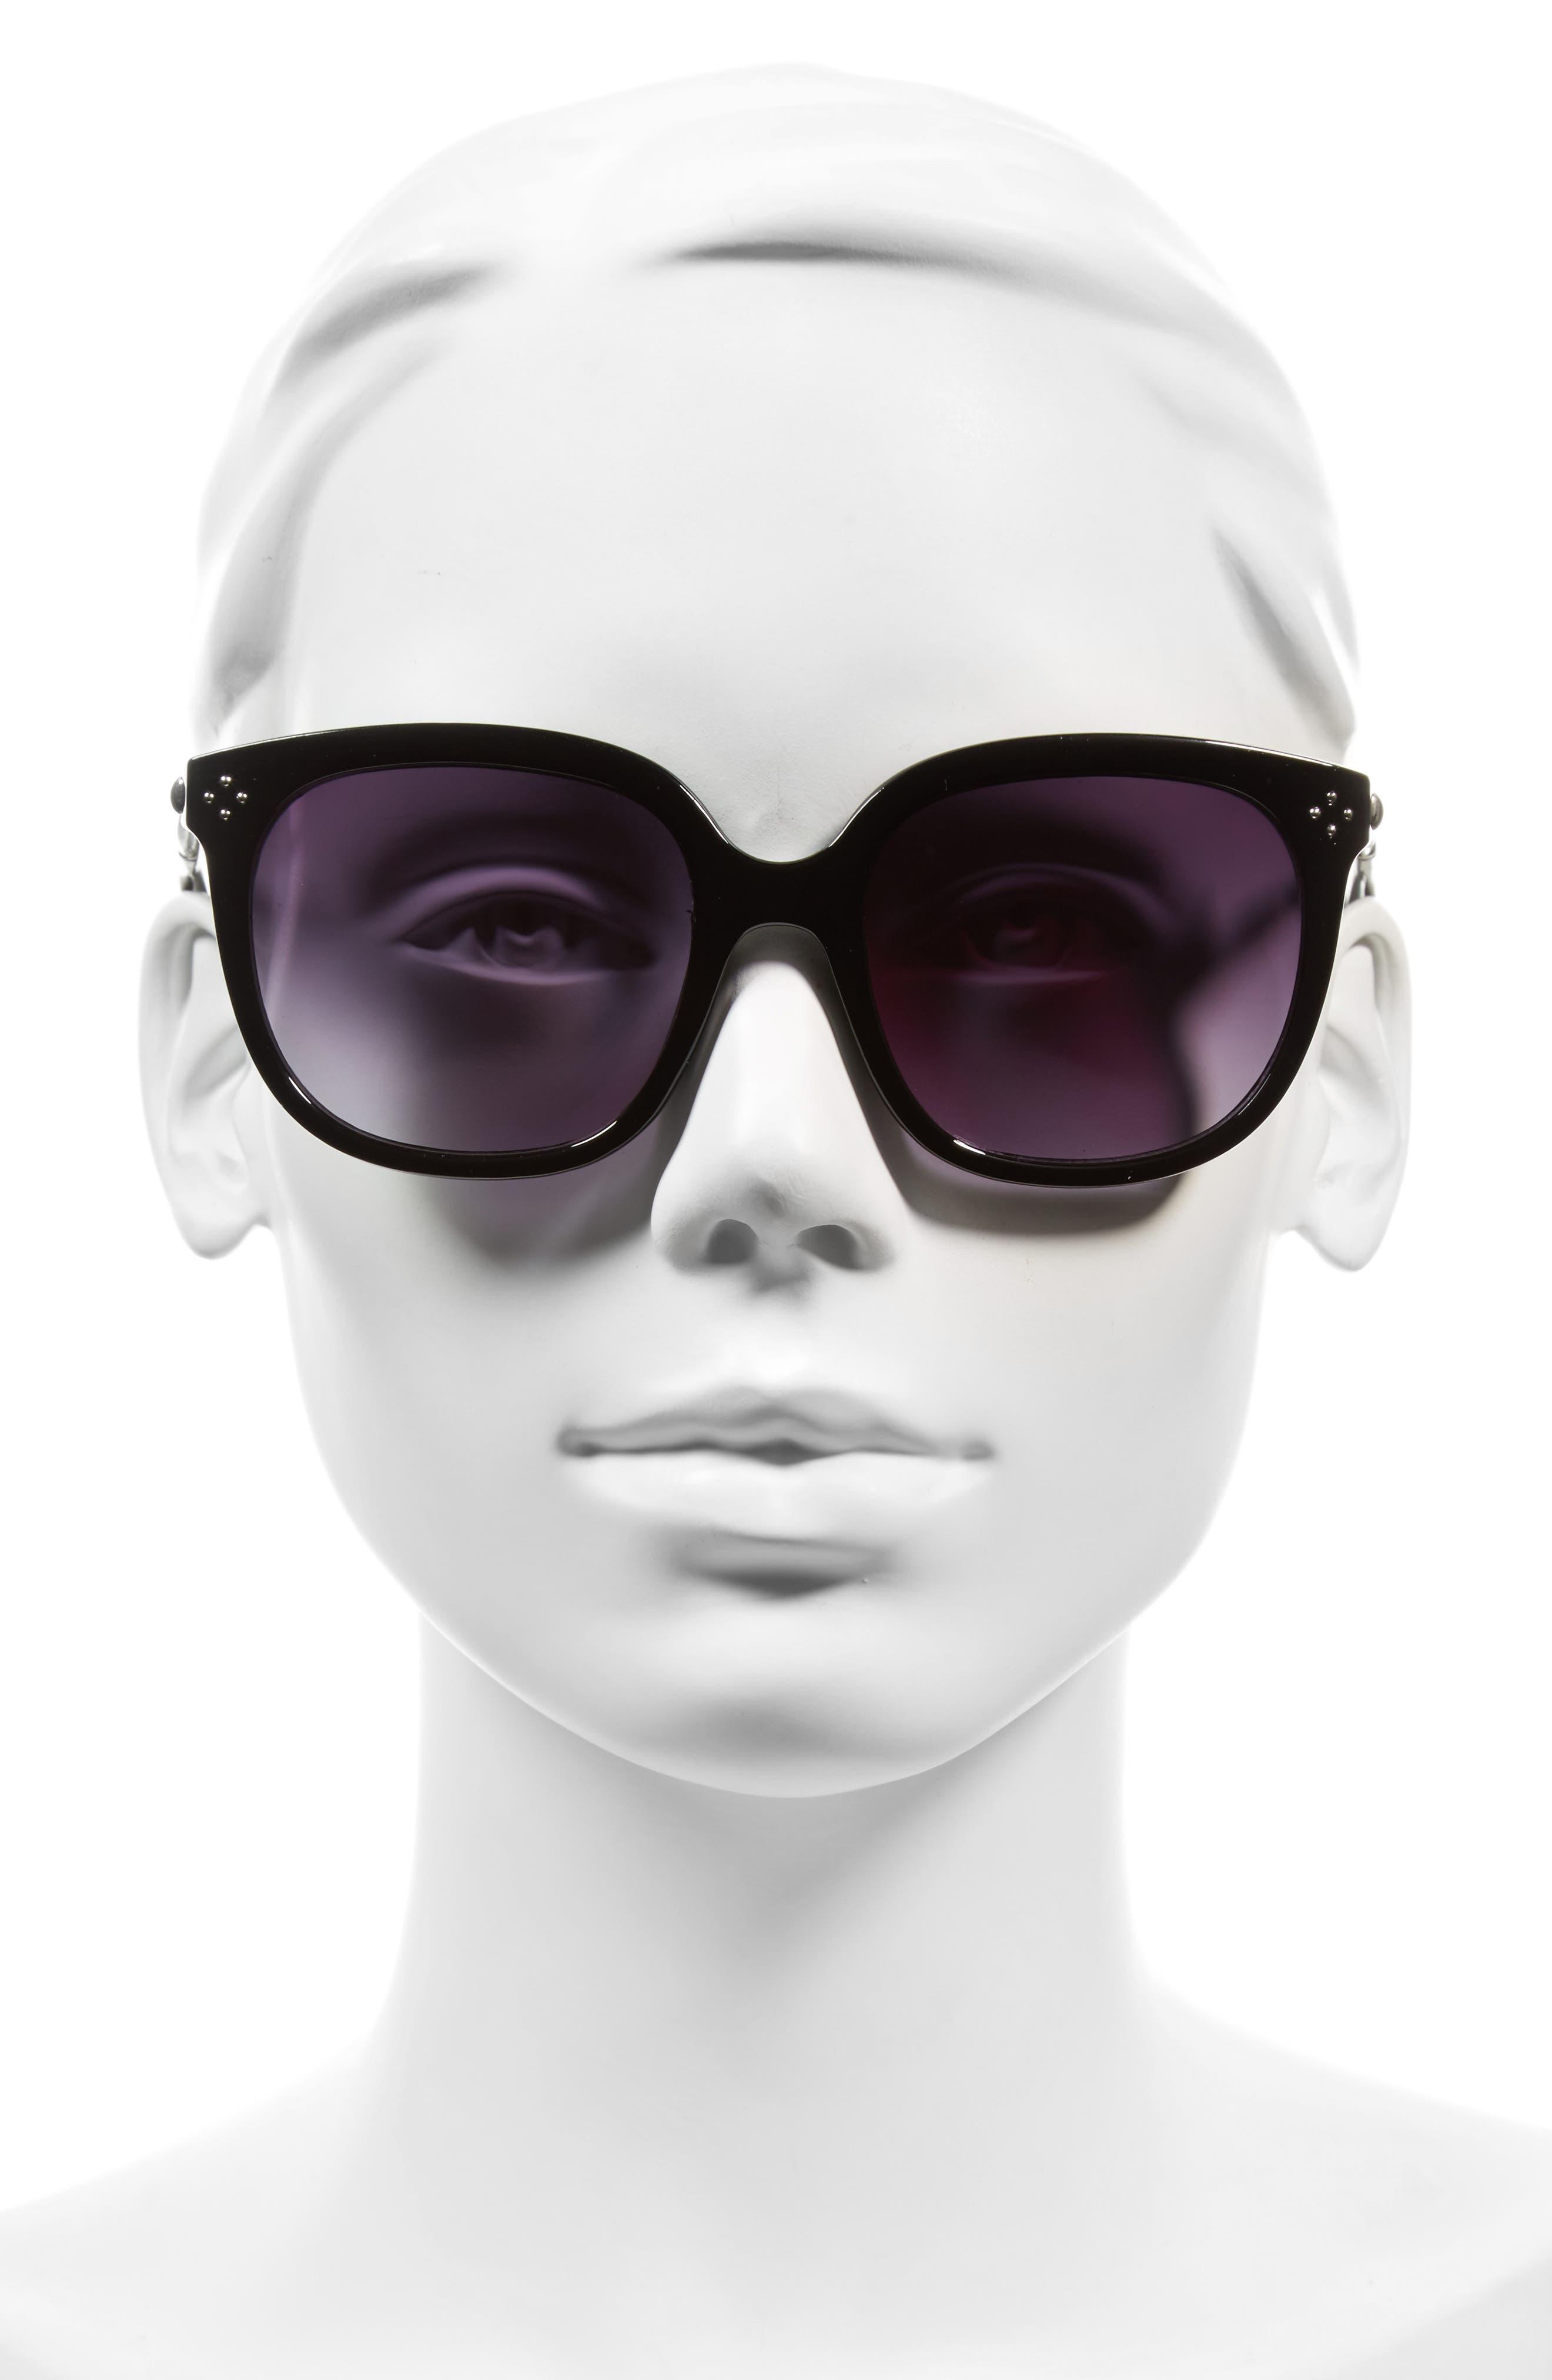 Dowager 52mm Sunglasses,                             Alternate thumbnail 2, color,                             001